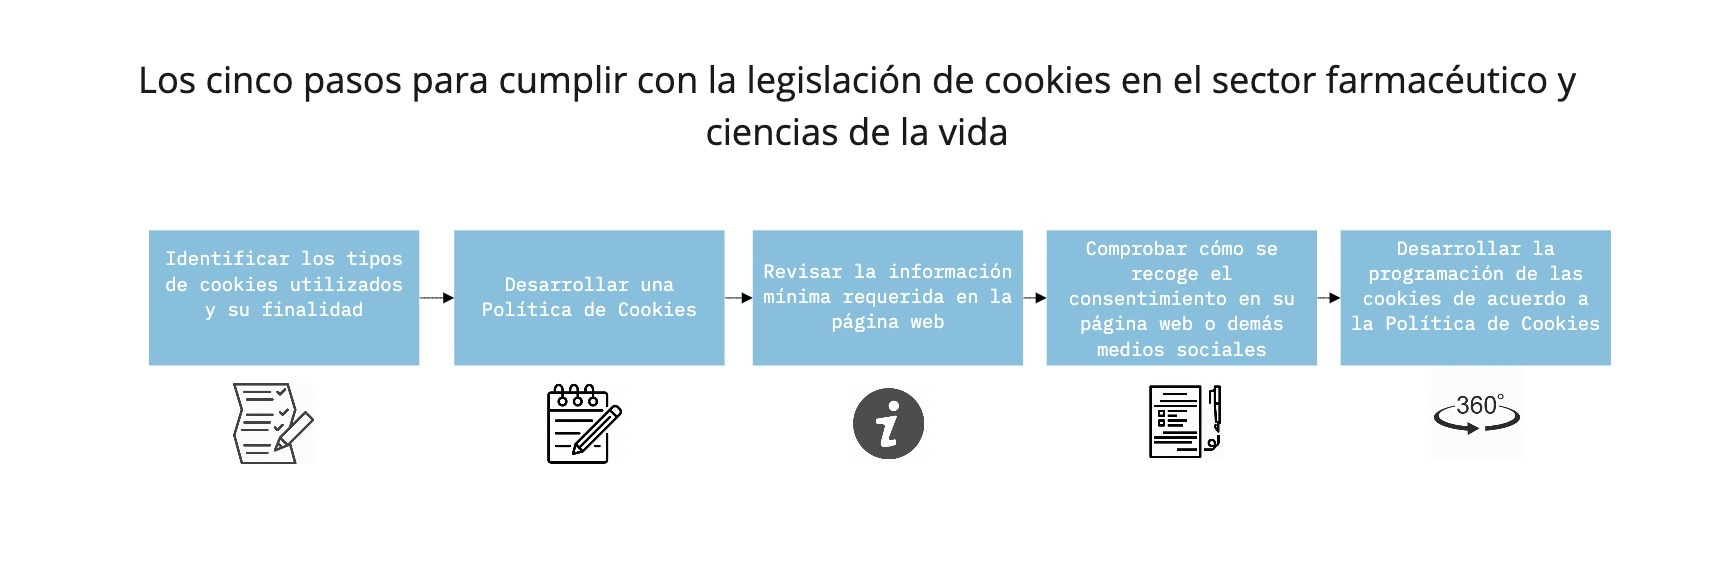 legislacion_cookies_sector_pharma